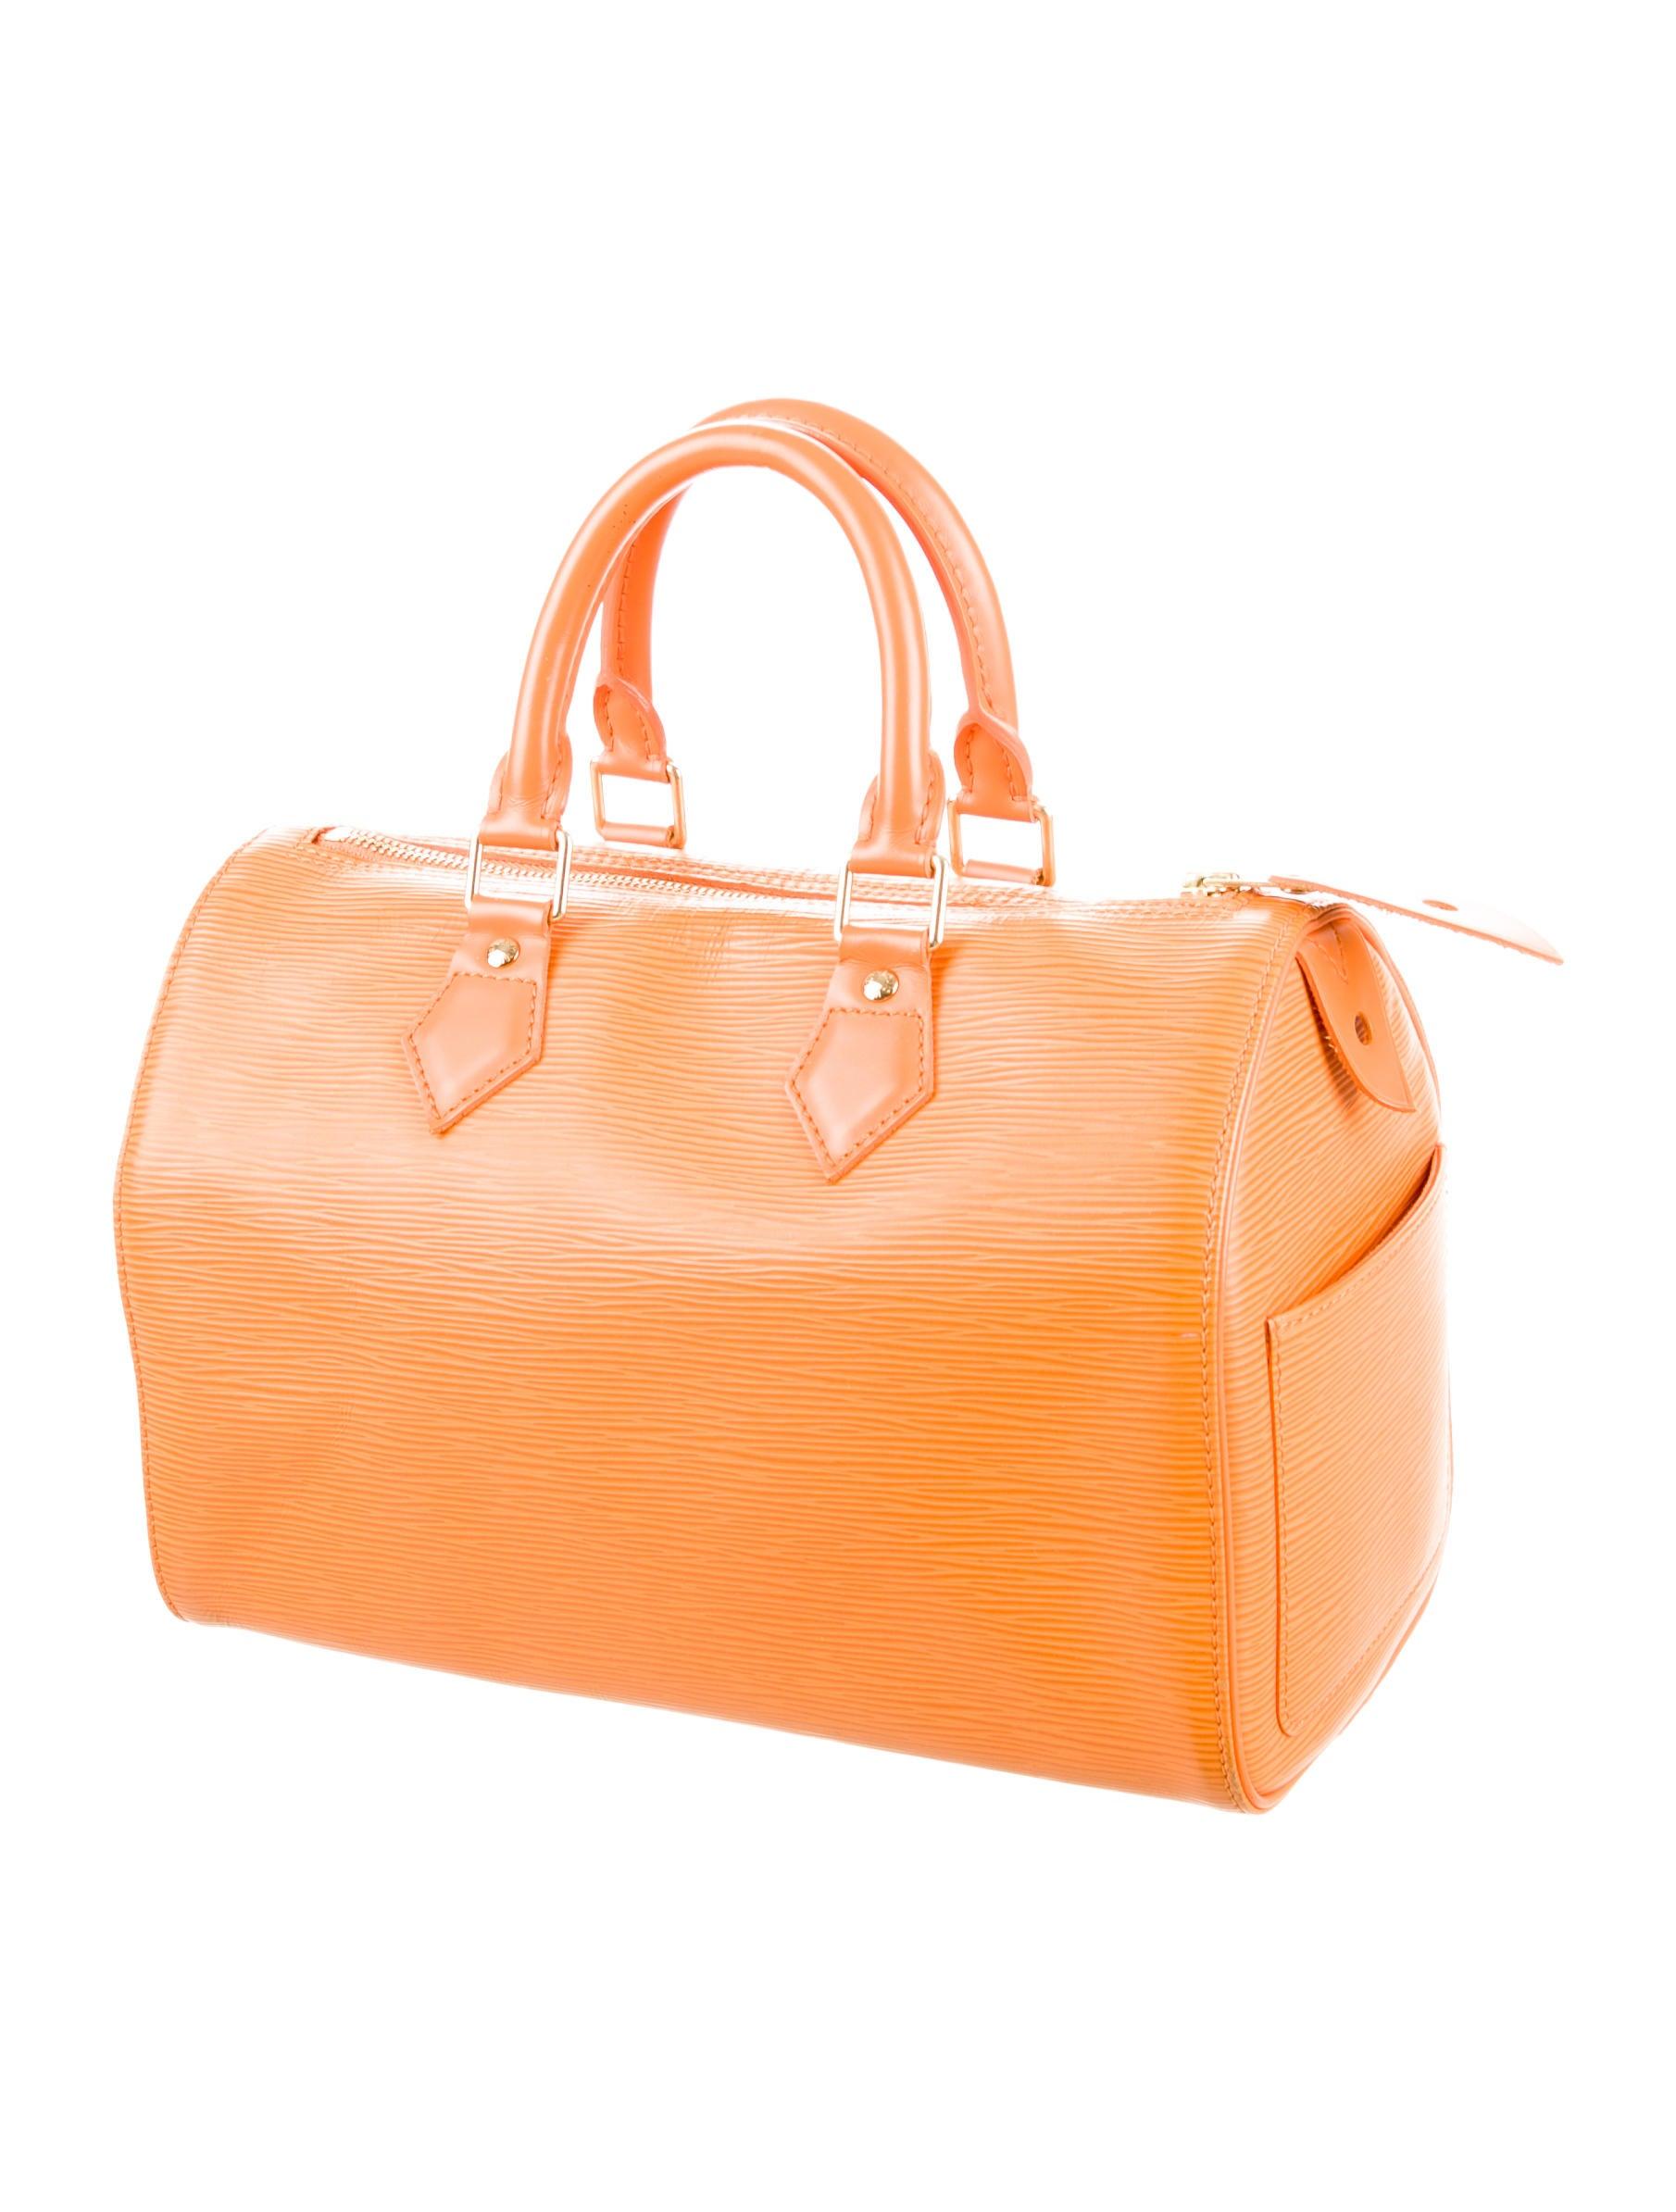 9f1399d5f411 Louis Vuitton Epi Speedy 25 - Handbags - LOU77412